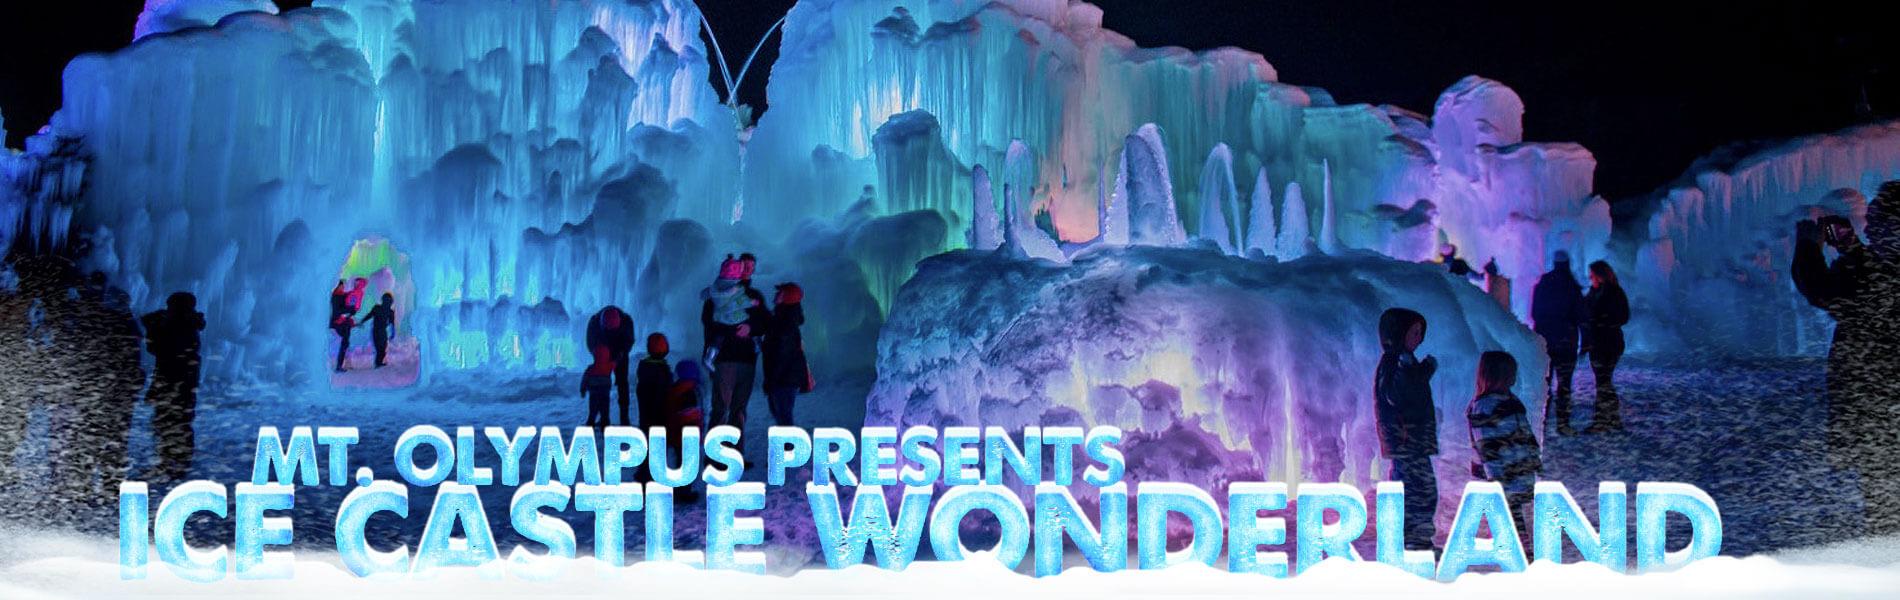 ice castles mt olympus